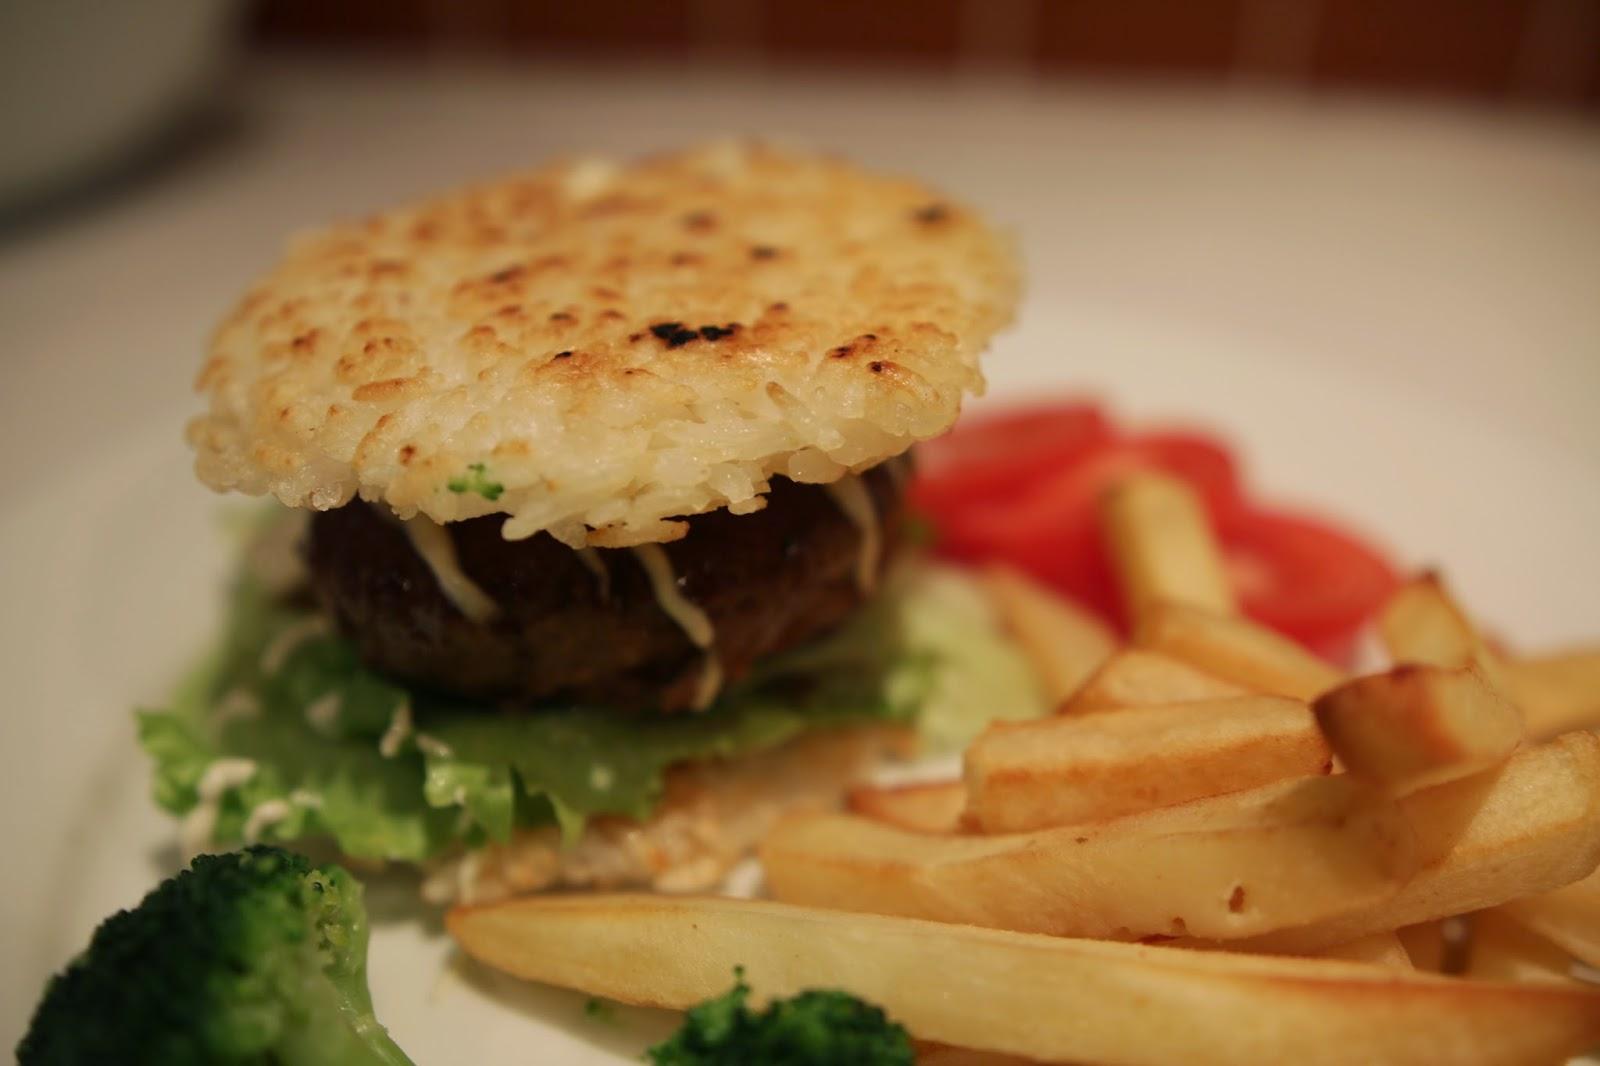 Gluten-free rice burger